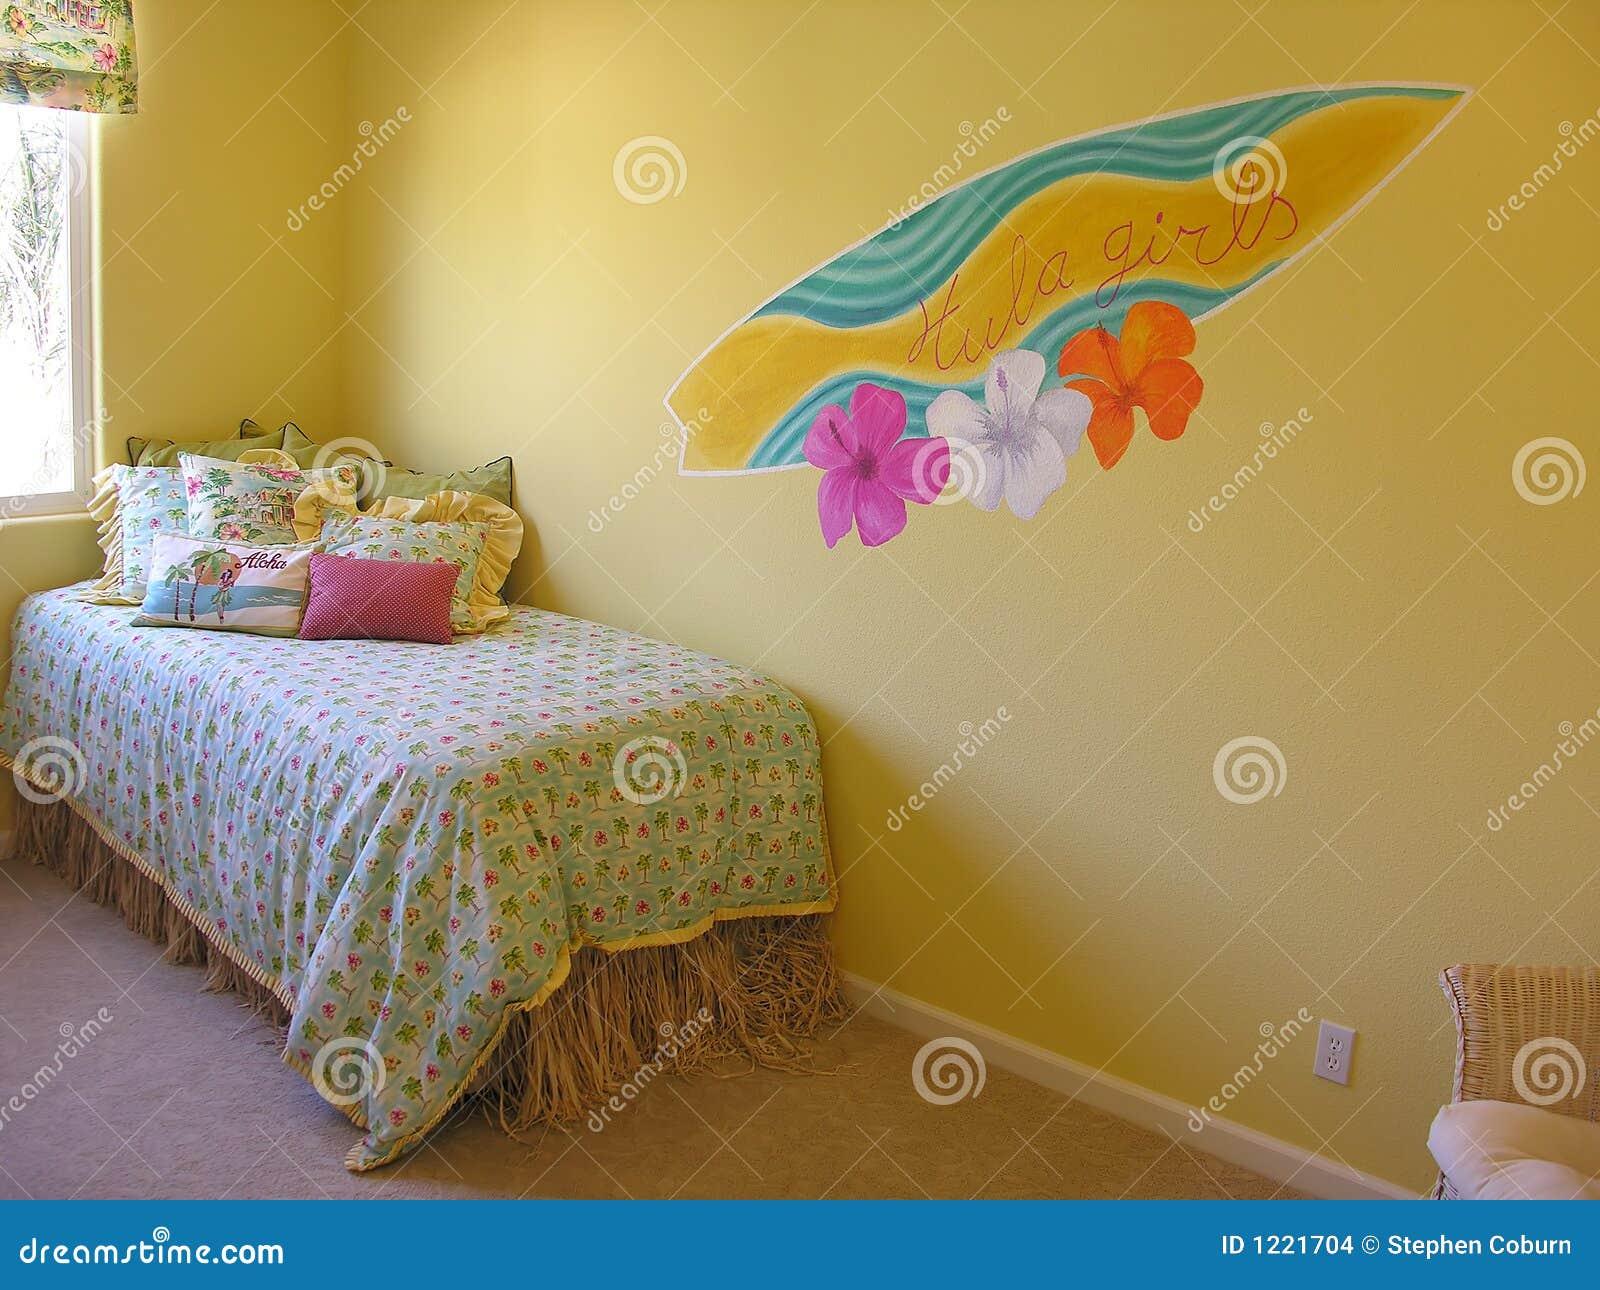 Hawaii Bedroom Stock Images Image 1221704